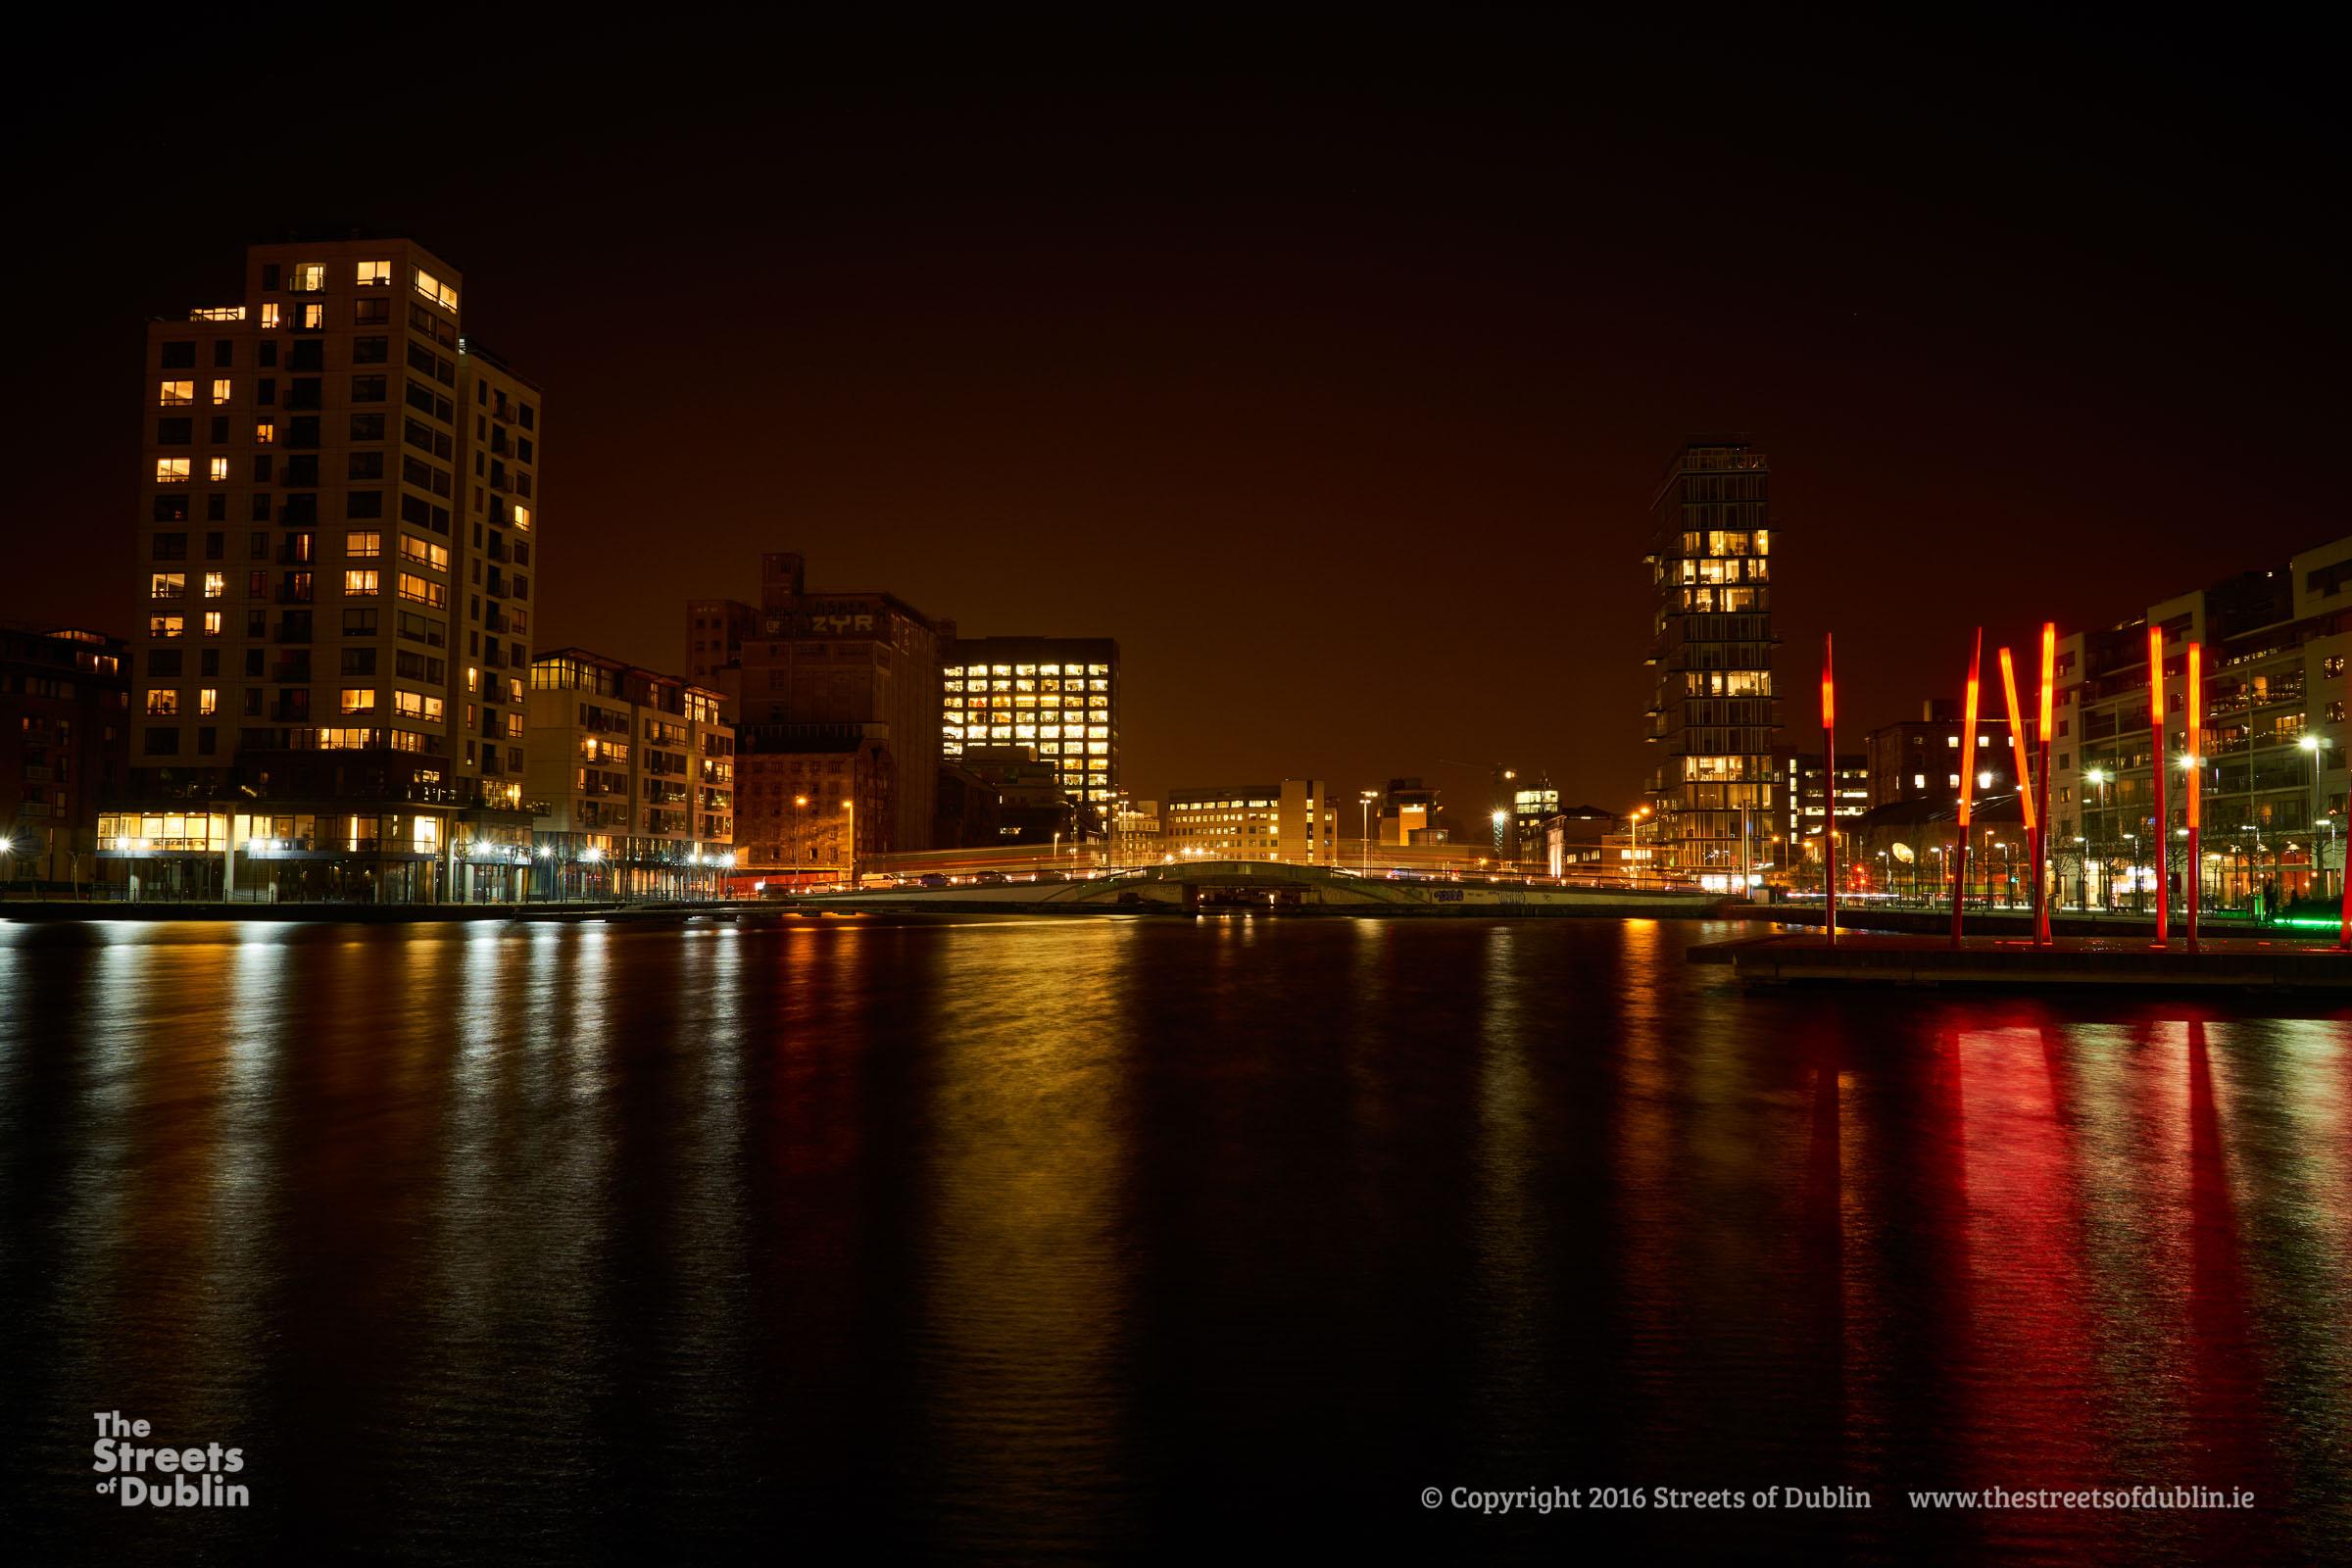 Streets-of-Dublin-Photo-16.jpg